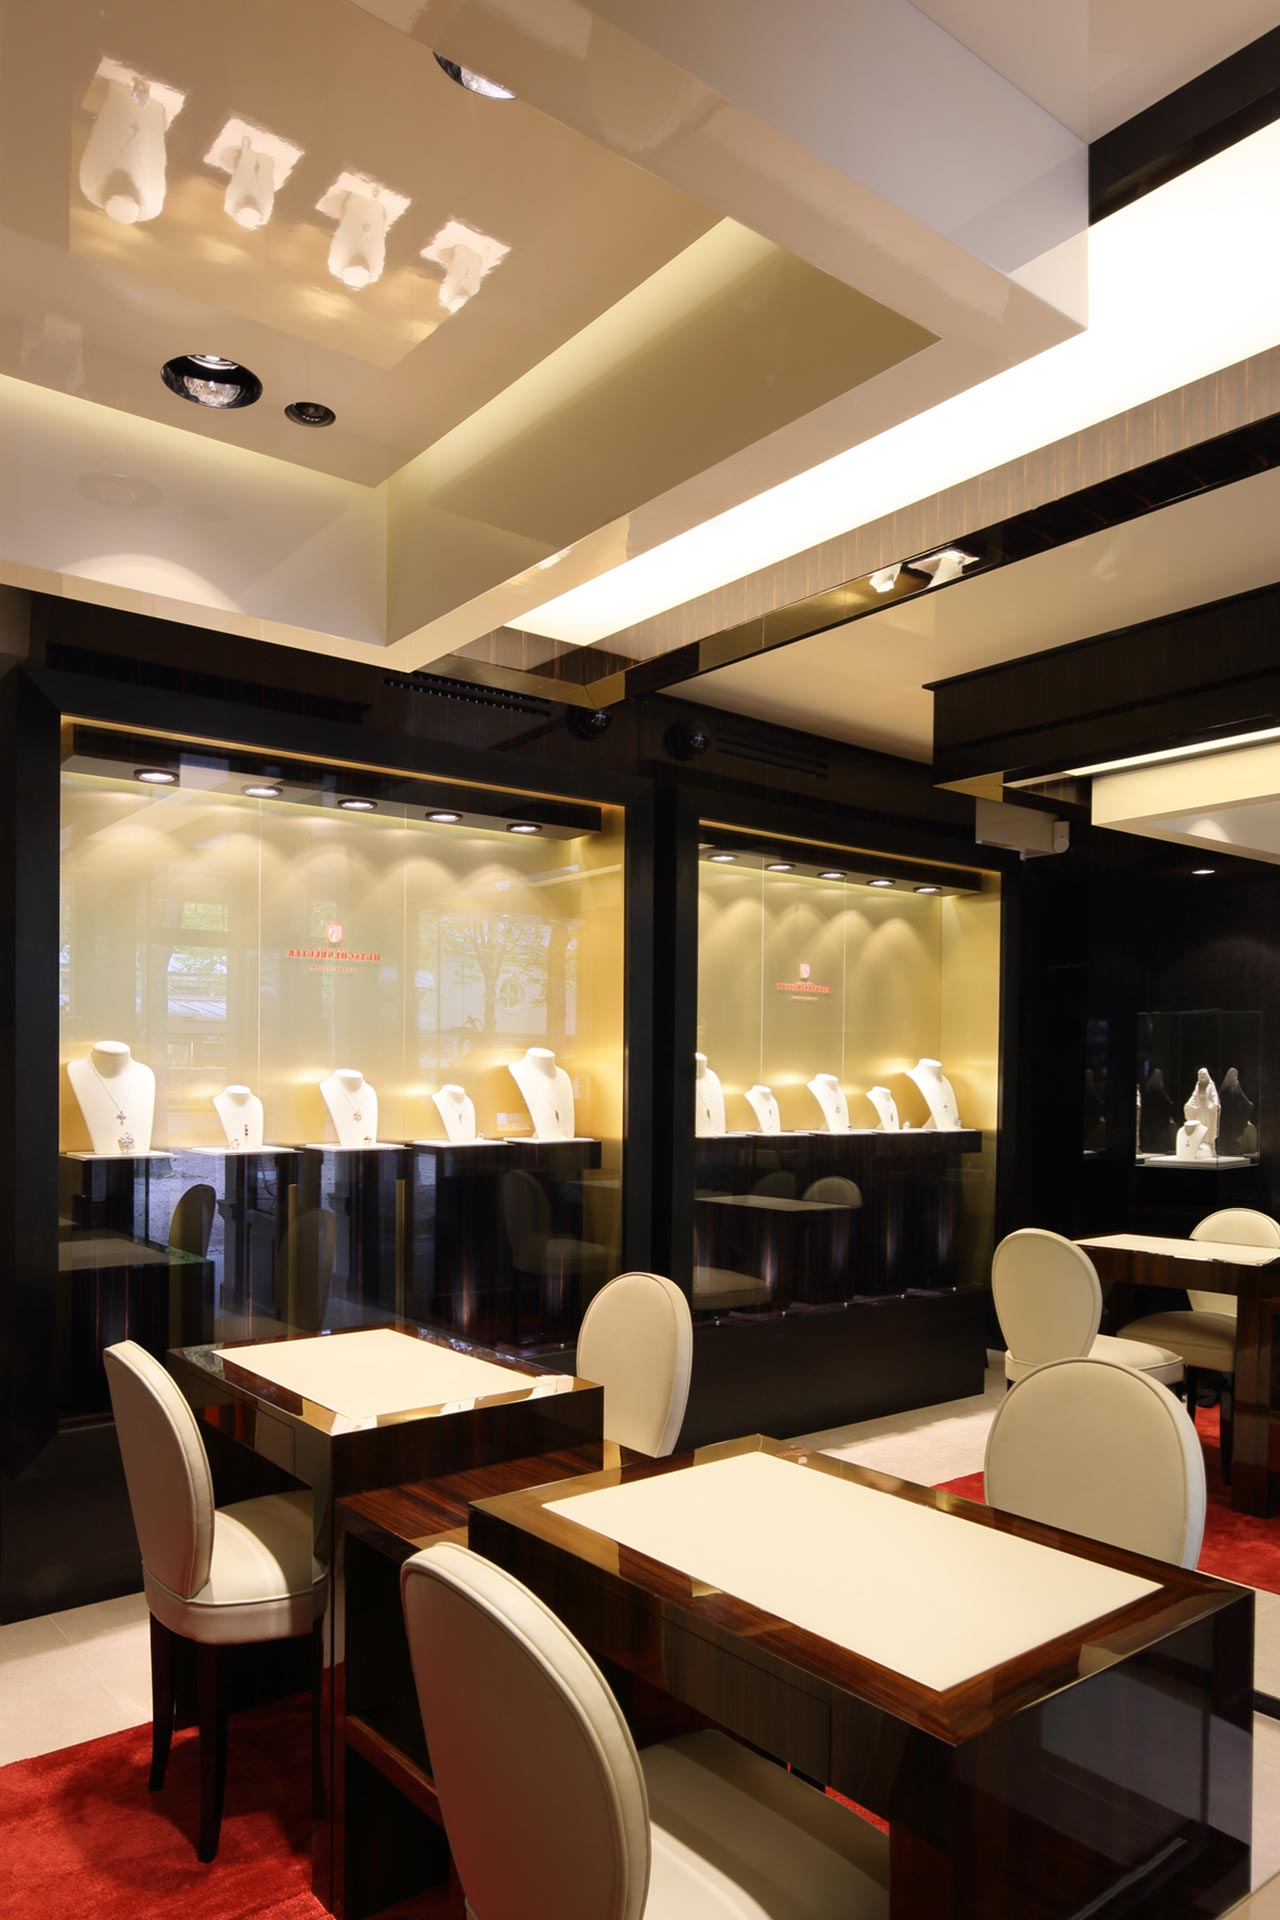 m belwerkst tte heck gmbh juwelier hutschenreuther 2130035 34. Black Bedroom Furniture Sets. Home Design Ideas